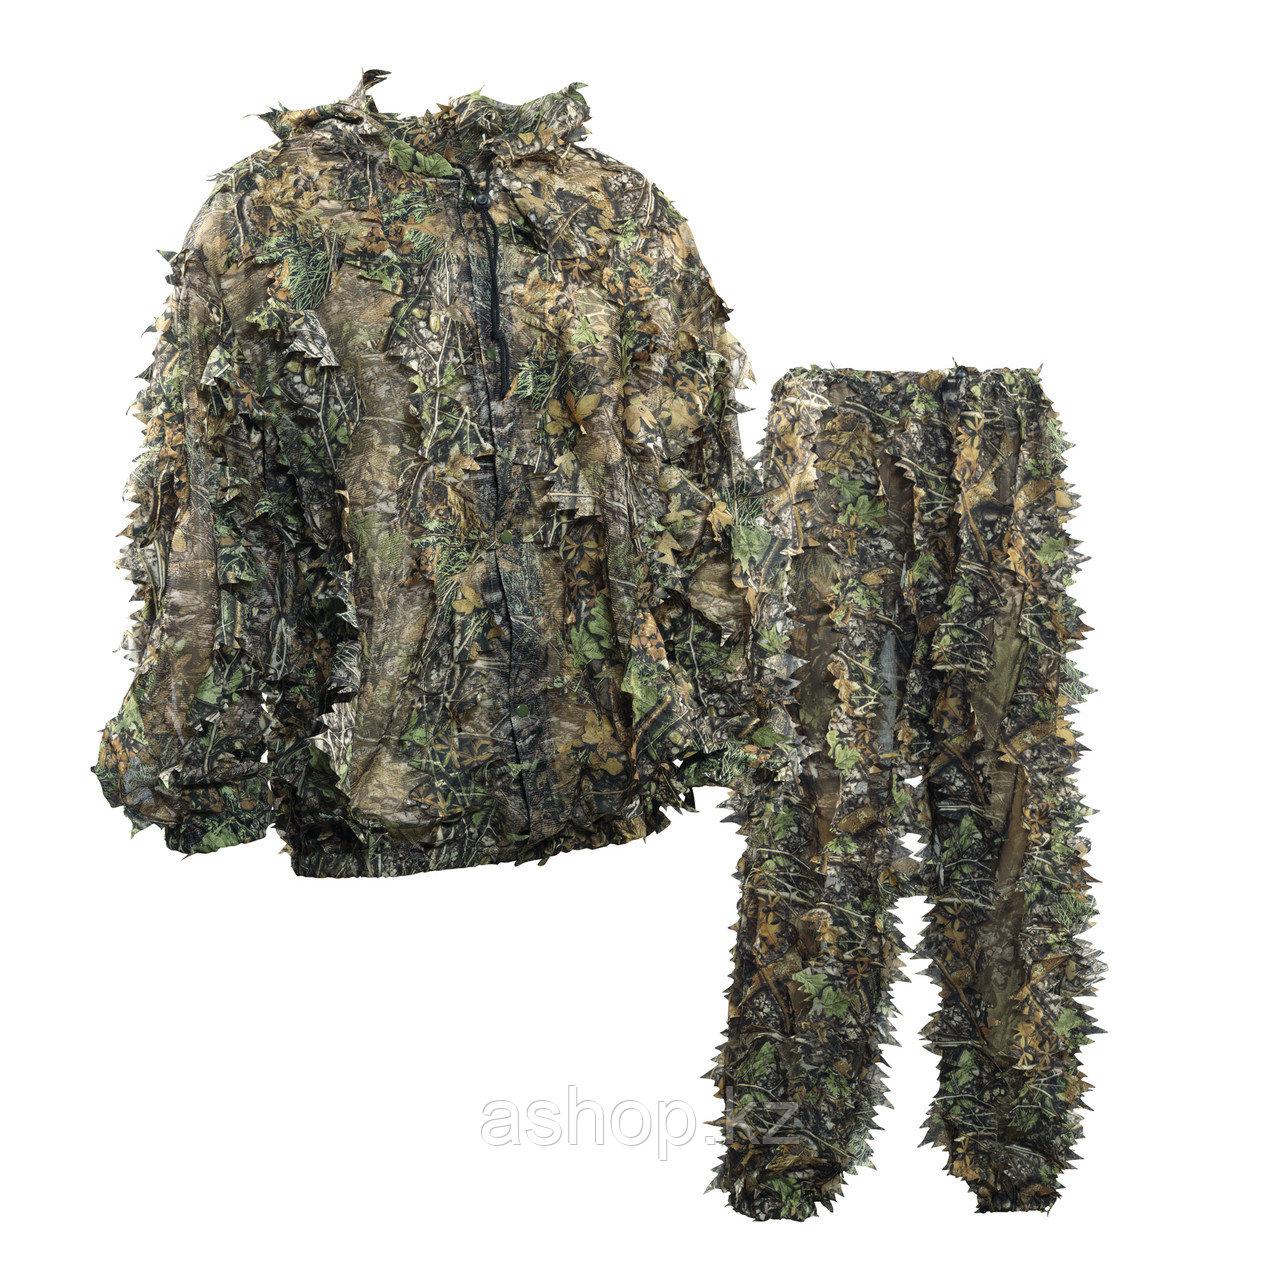 Маскировочный костюм Deerhunter Sneaky 3D, Цвет: Лес, Размер: 56-58 (2XL\3XL), (2065)